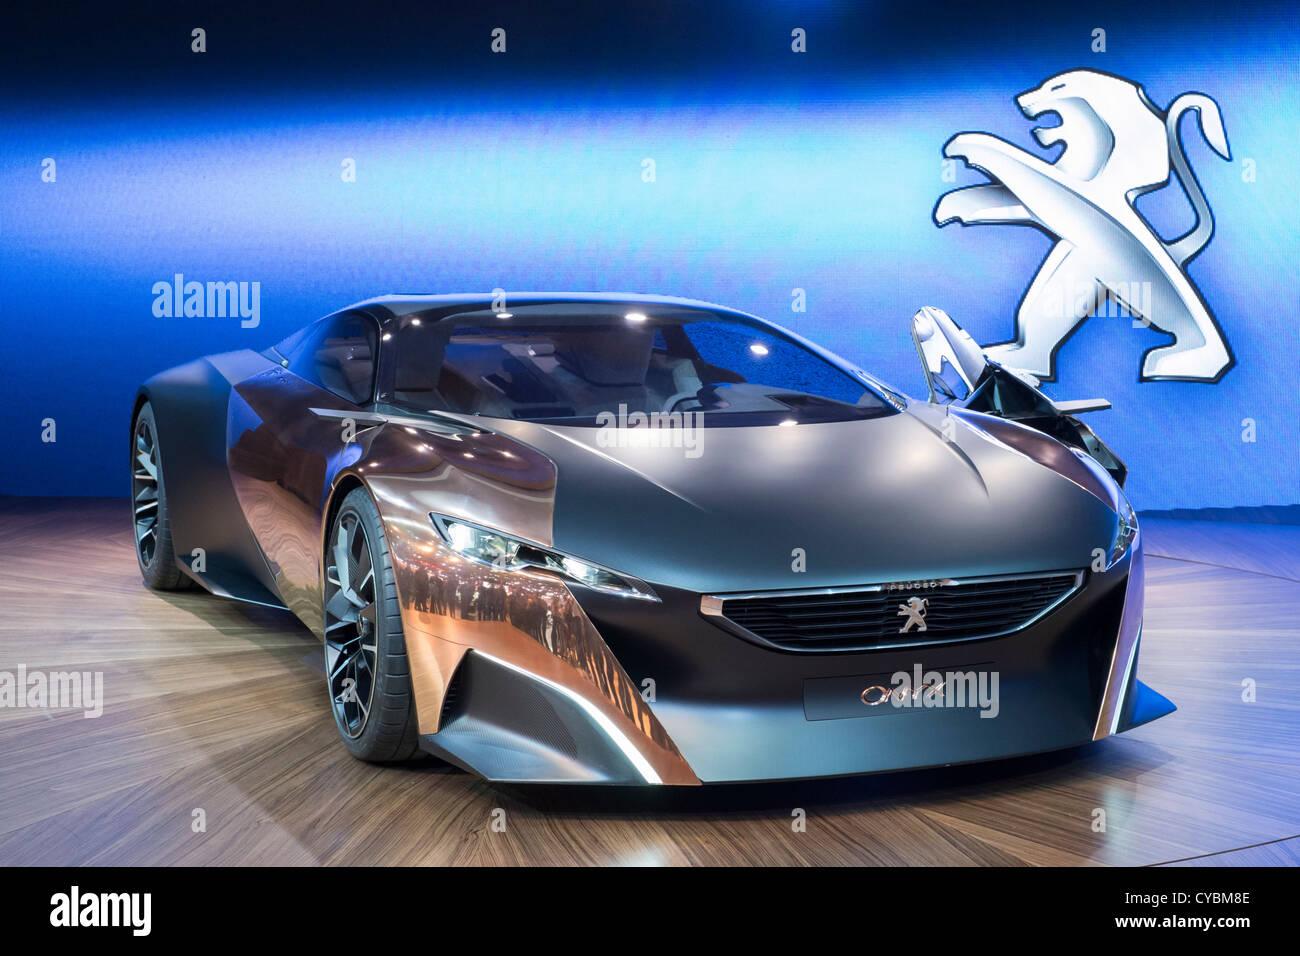 Konzeptfahrzeug Peugeot Onyx auf der Paris Motor Show 2012 Stockbild